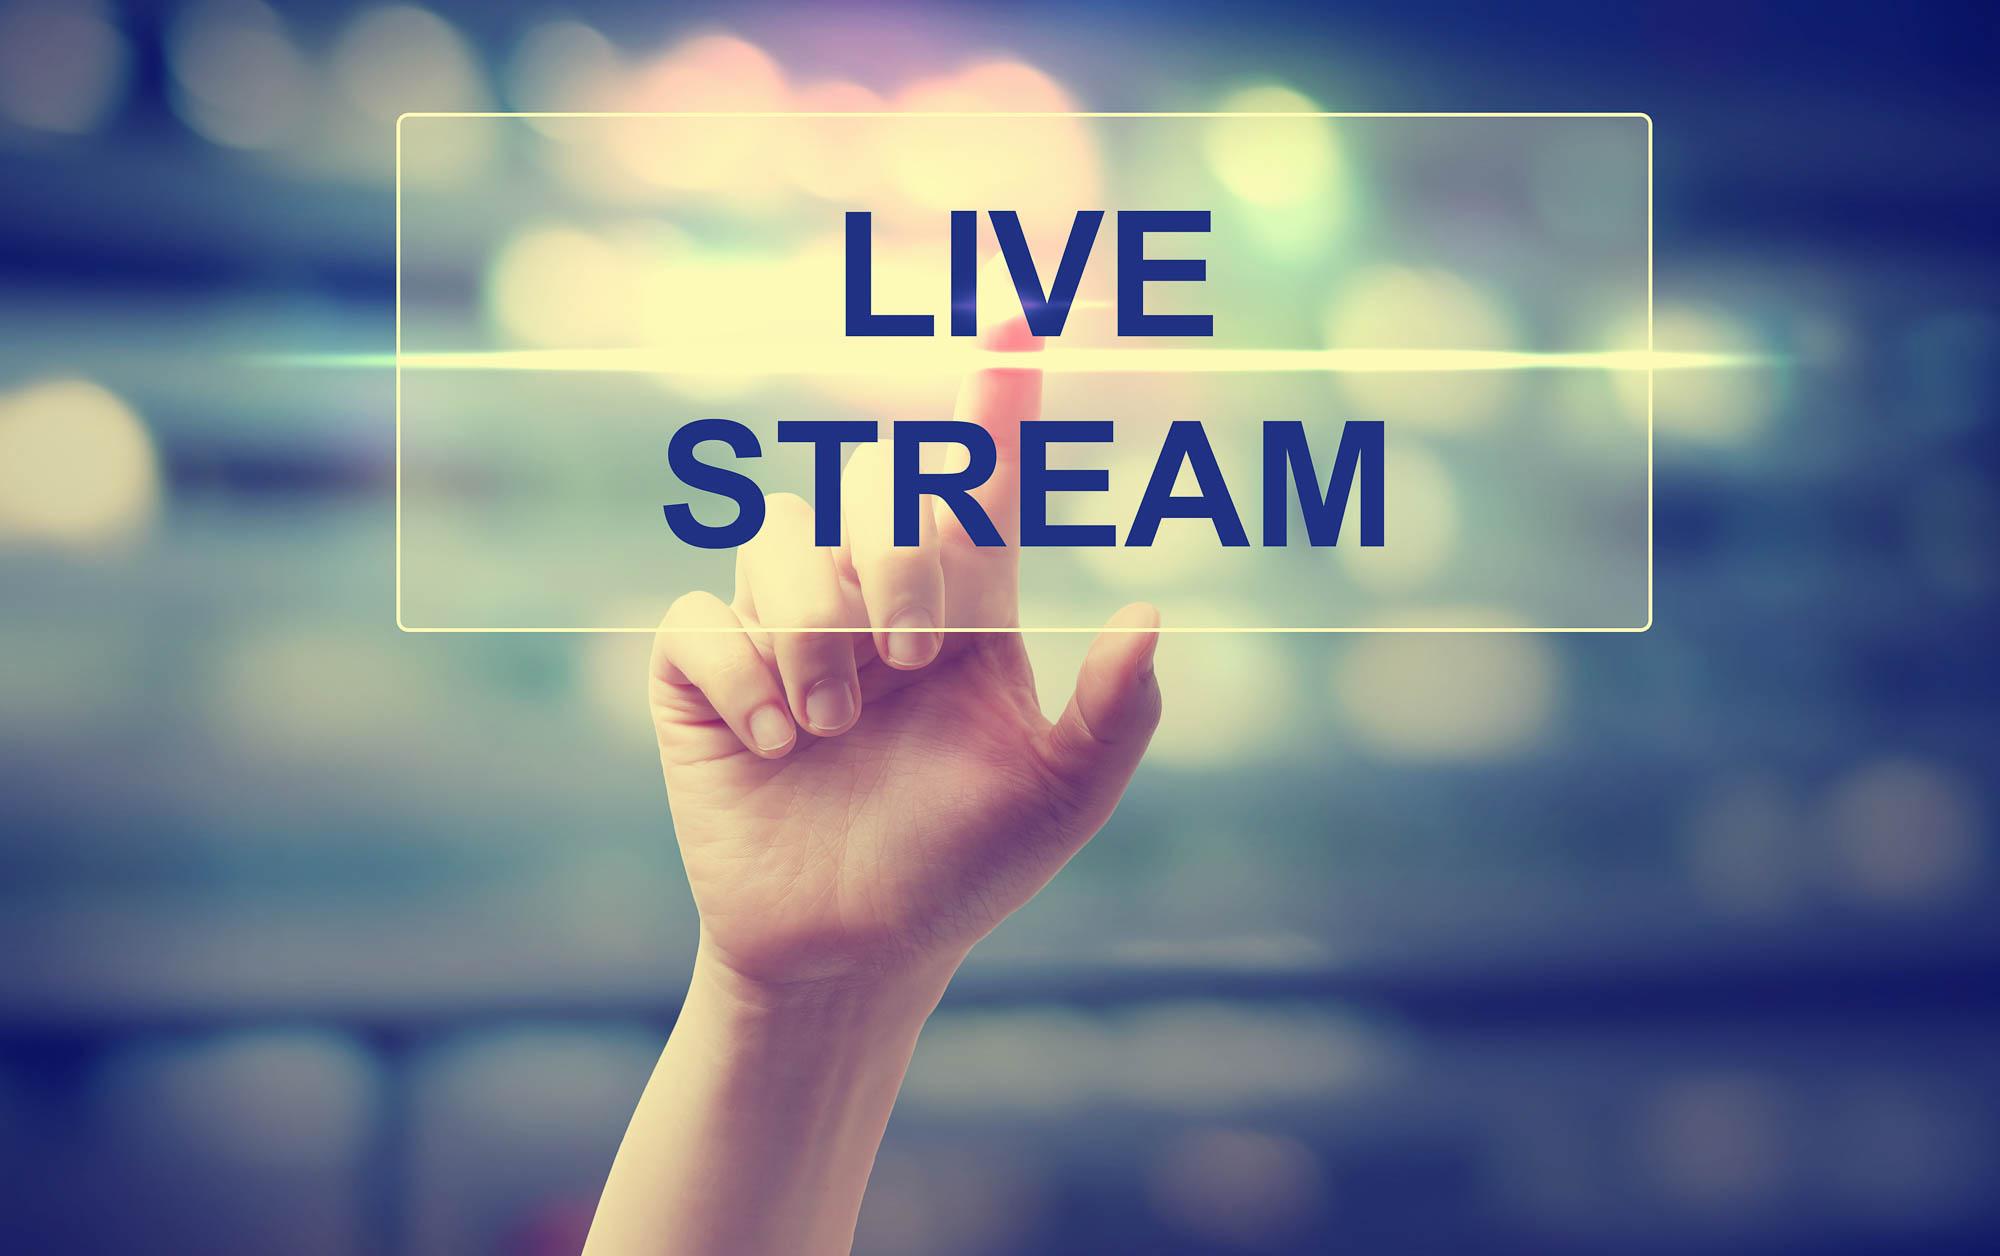 marco pugliese videomaker live streaming eventi - diretta evento facebook